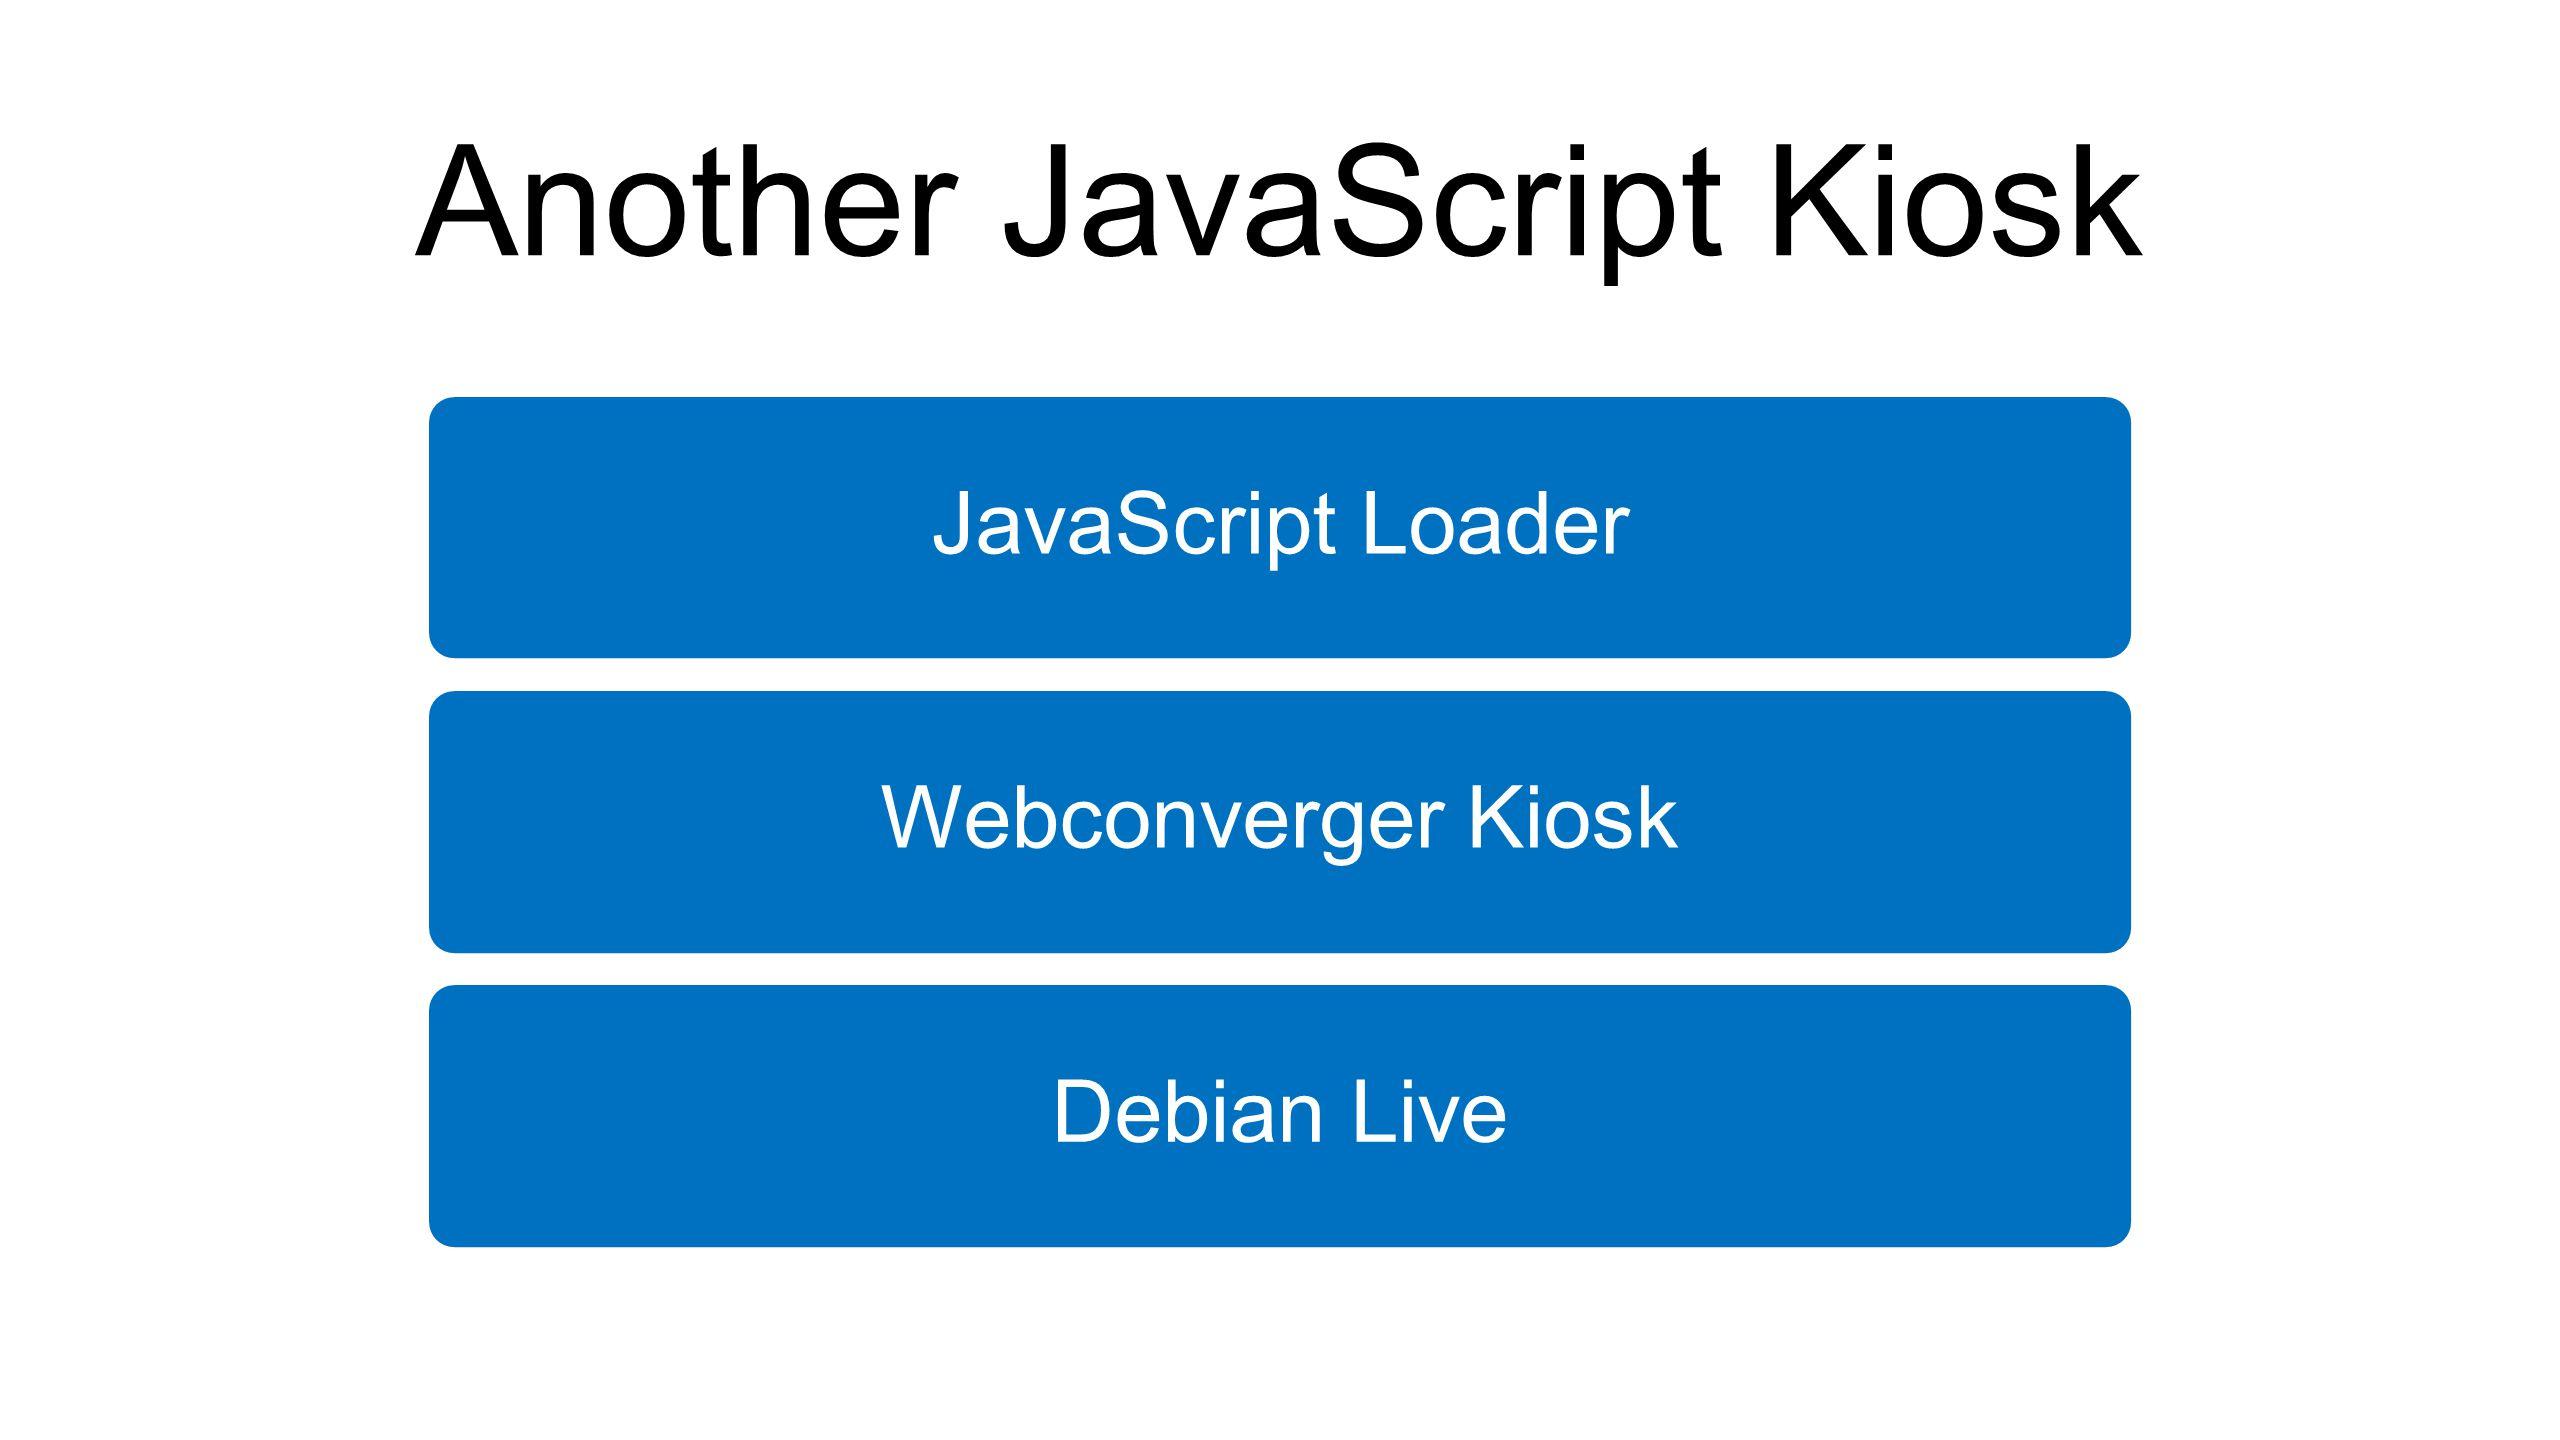 Another JavaScript Kiosk JavaScript LoaderWebconverger KioskDebian Live